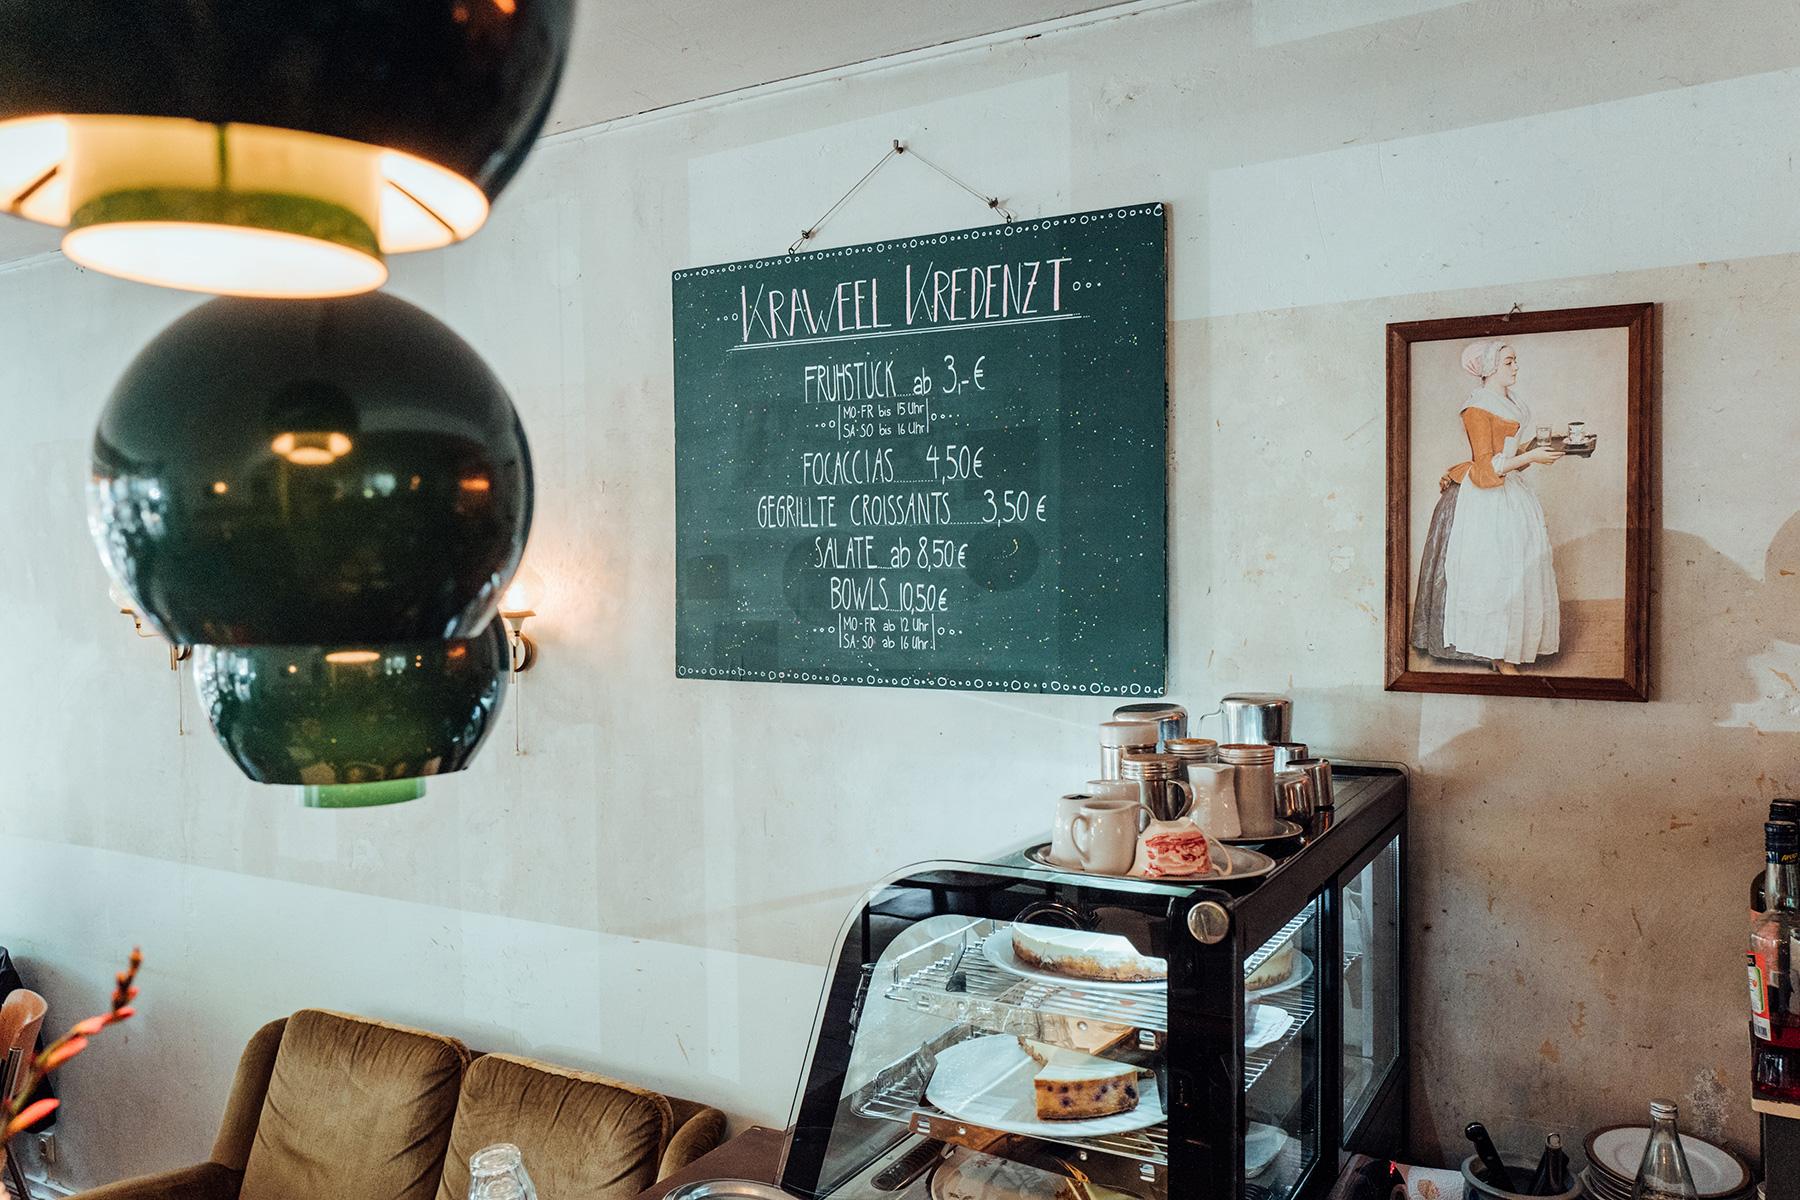 Kraweel StPauli cafe geheimtipp hamburg lisa knauer 18